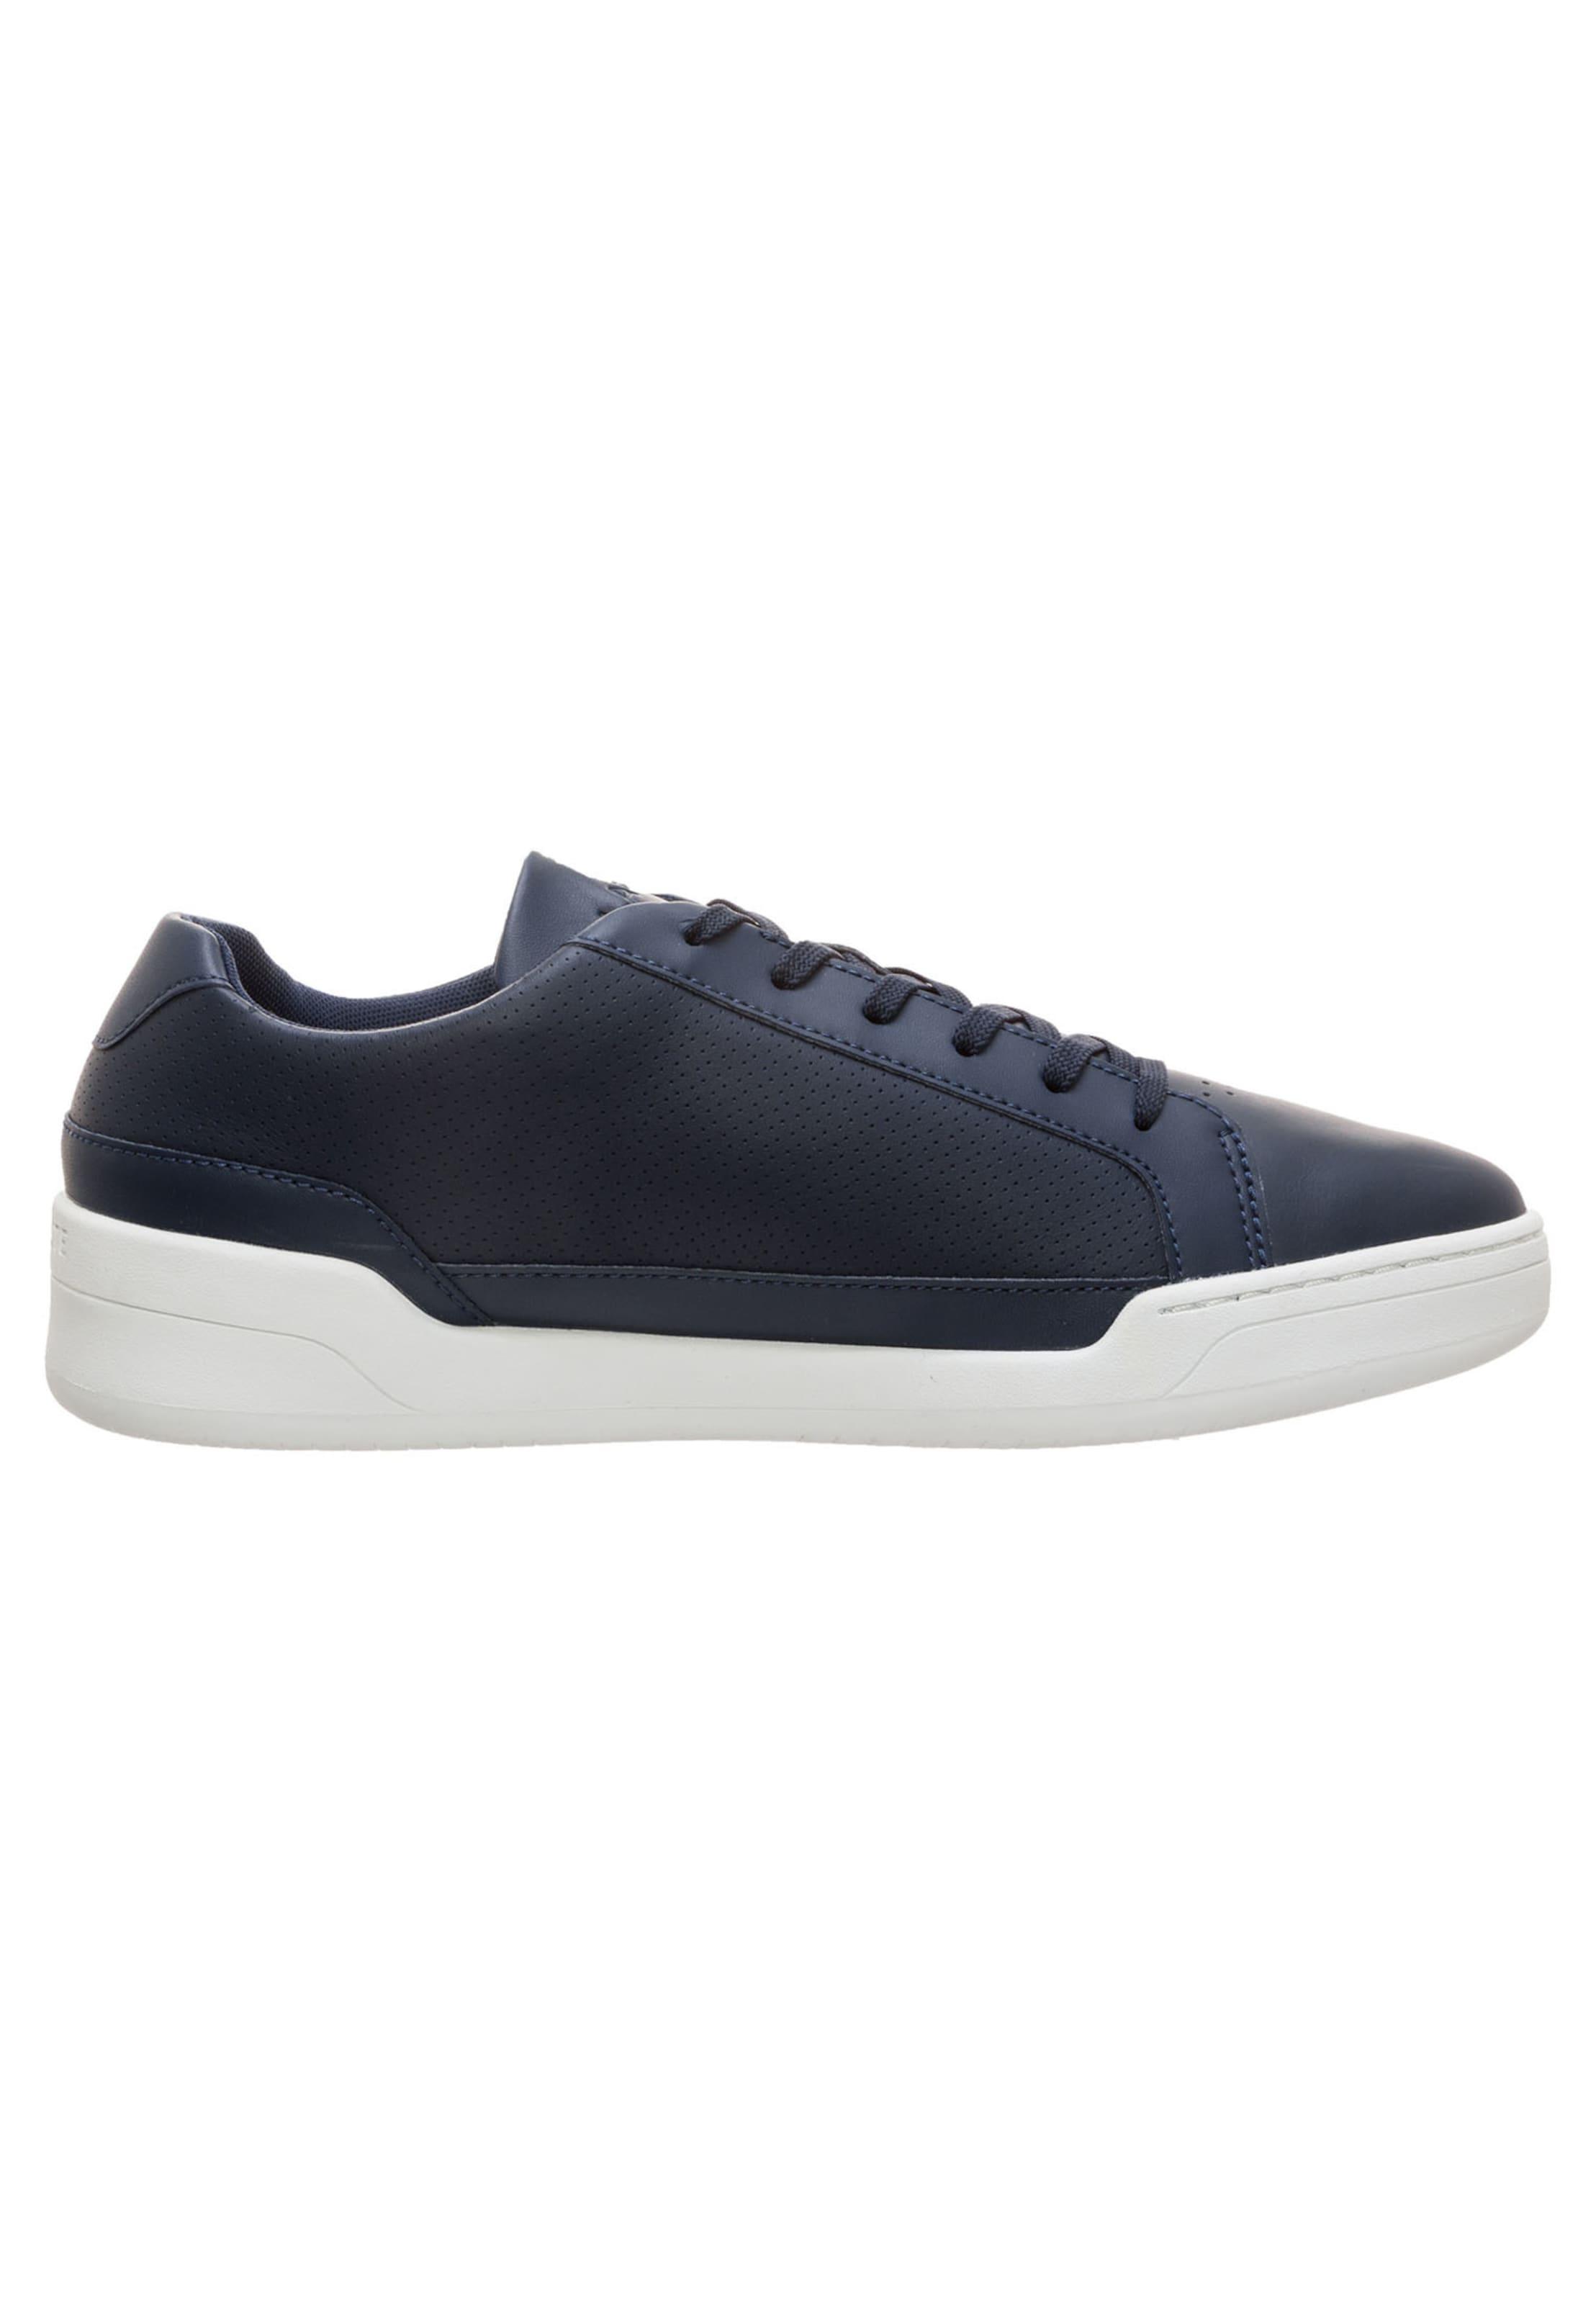 'challenge' Sneaker Dunkelblau Sneaker 'challenge' Lacoste Sneaker In 'challenge' In Lacoste Lacoste Dunkelblau wOn0NXk8PZ